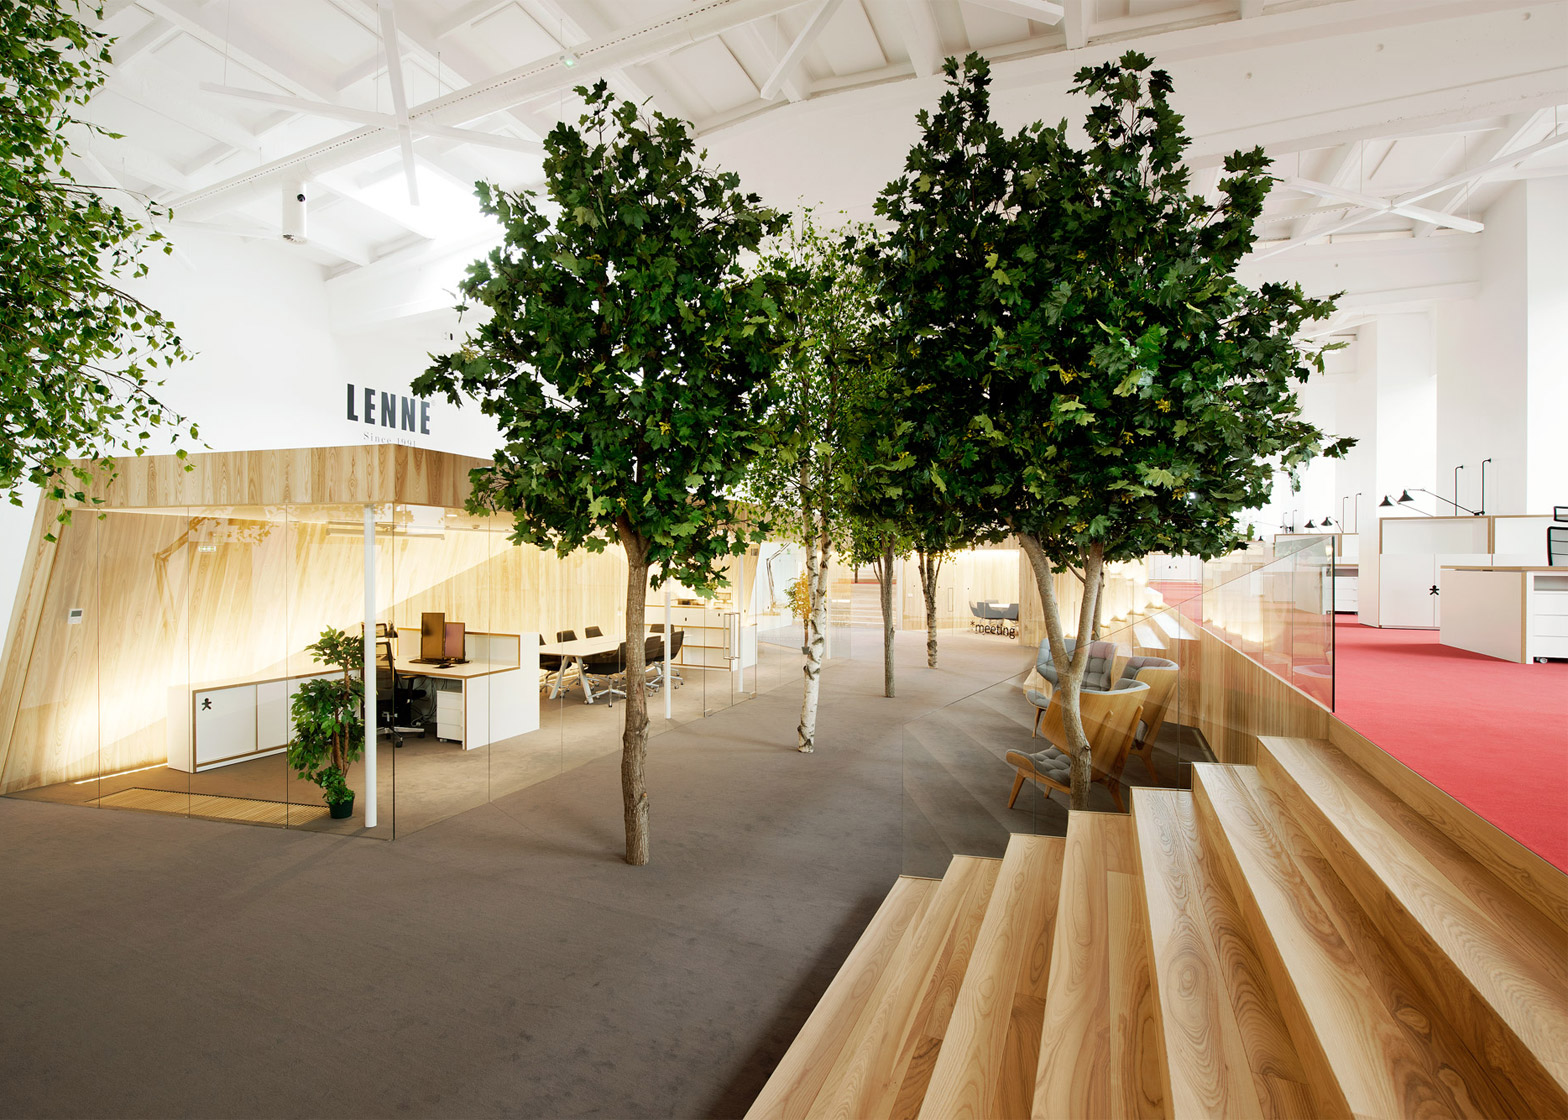 Office-Lenne_Estonia_KAMP-Arhitektid_dezeen_1568_8